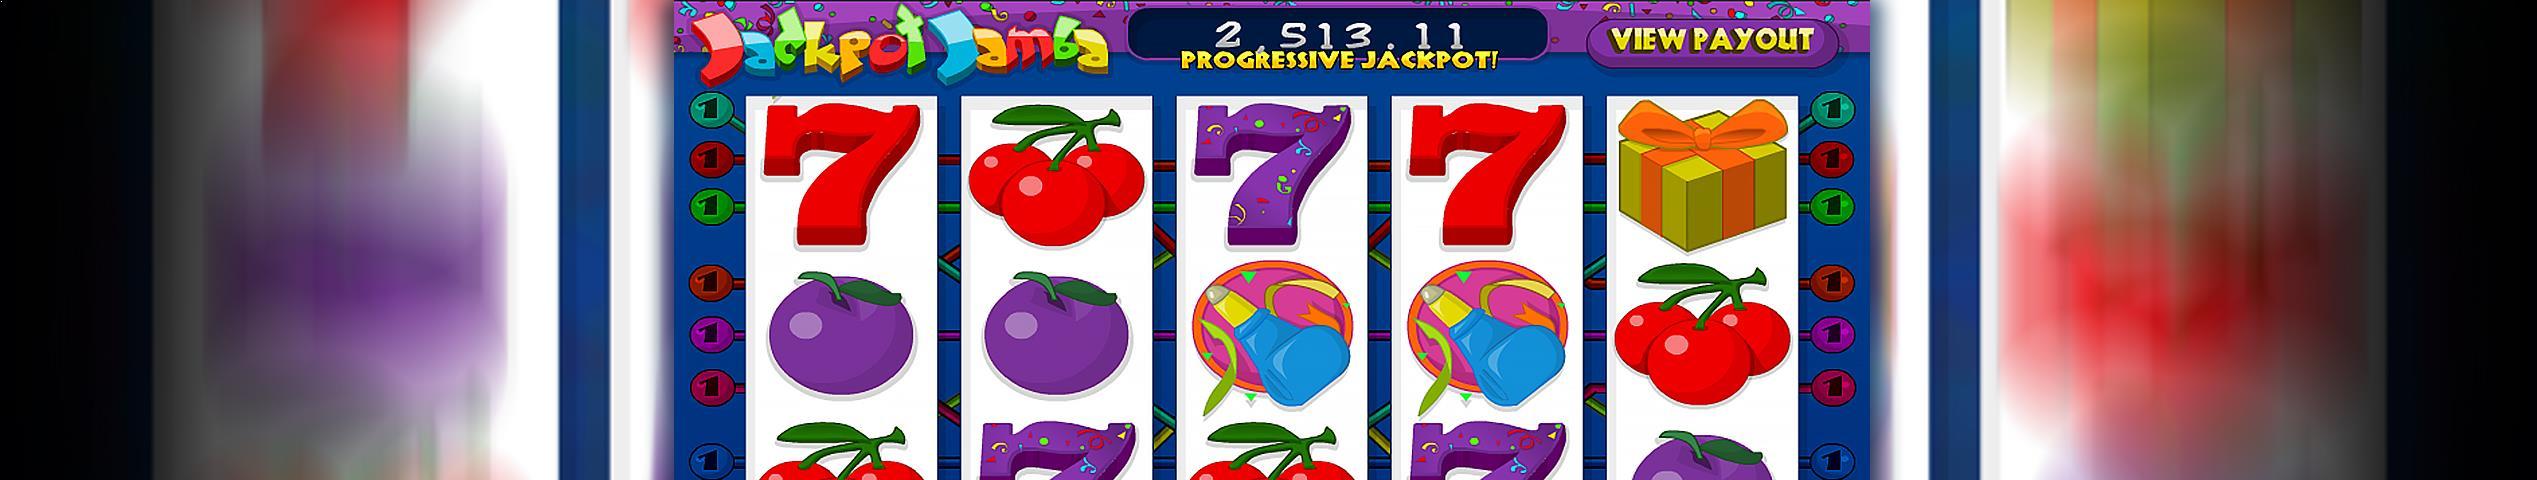 Jackpot Jamba betsoft jocuri slot slider